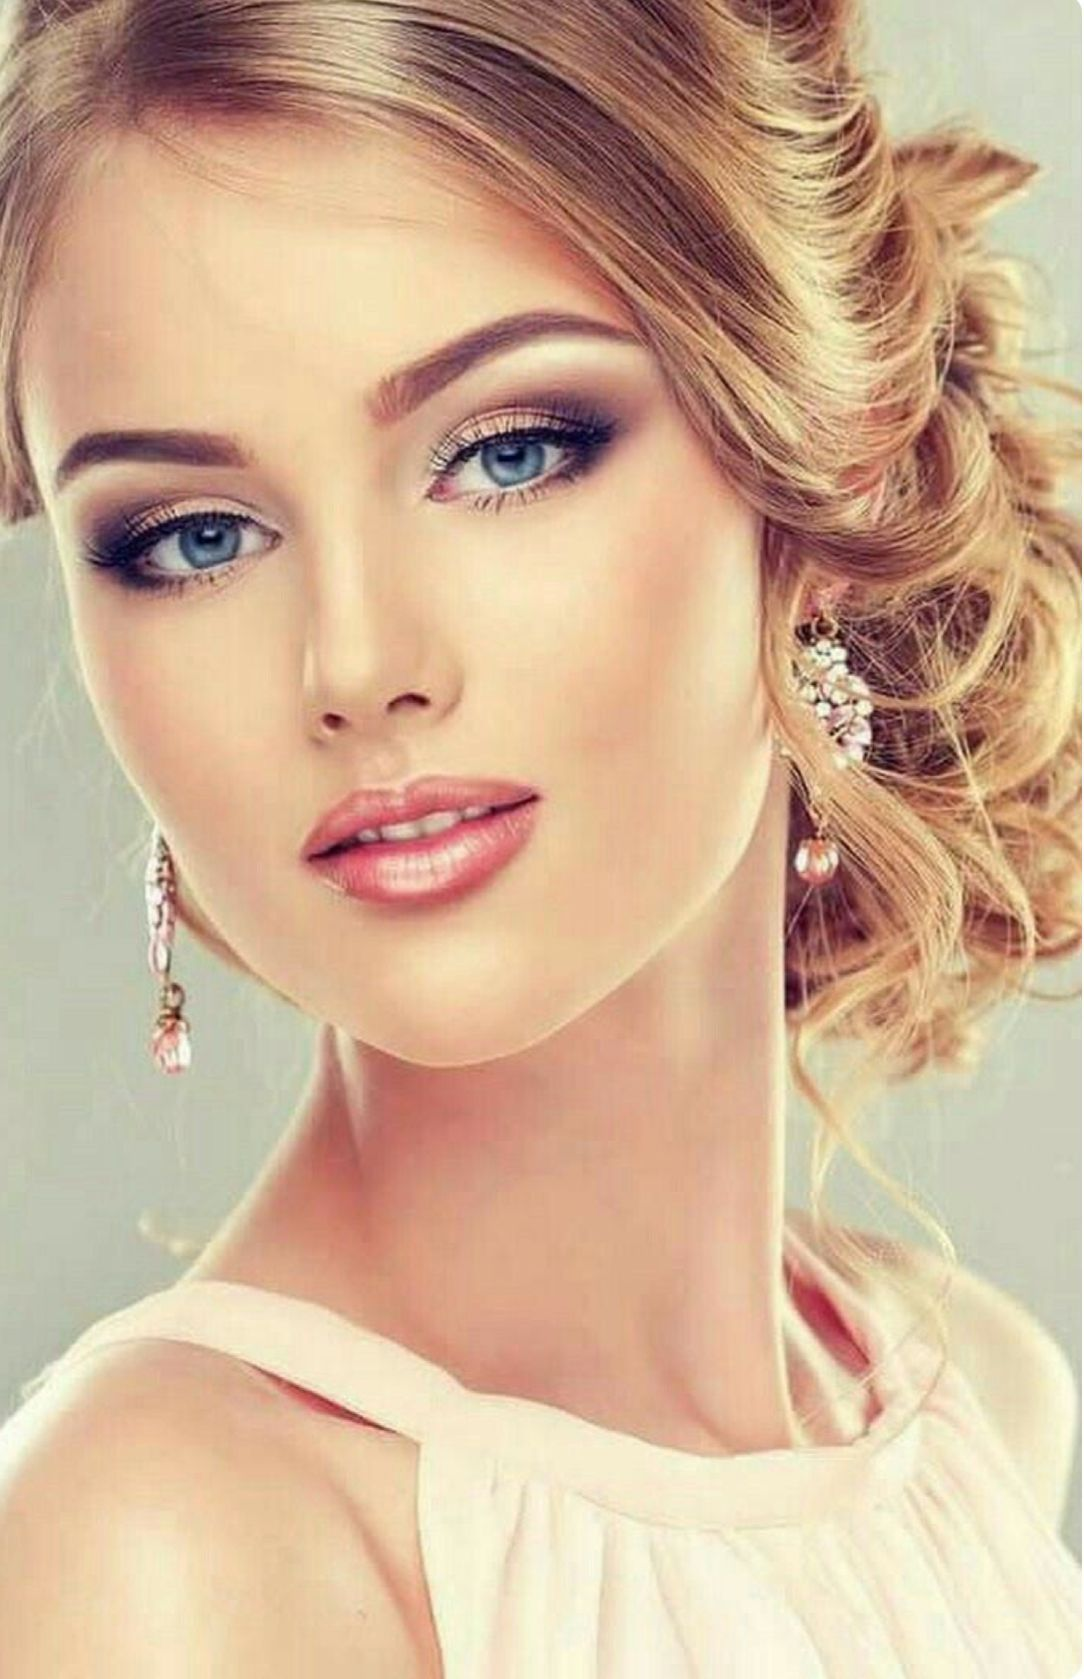 By Bookvl Blogspot And Look More Now Rosto Bonito Cabelo Glamuroso Rostos Bonitos